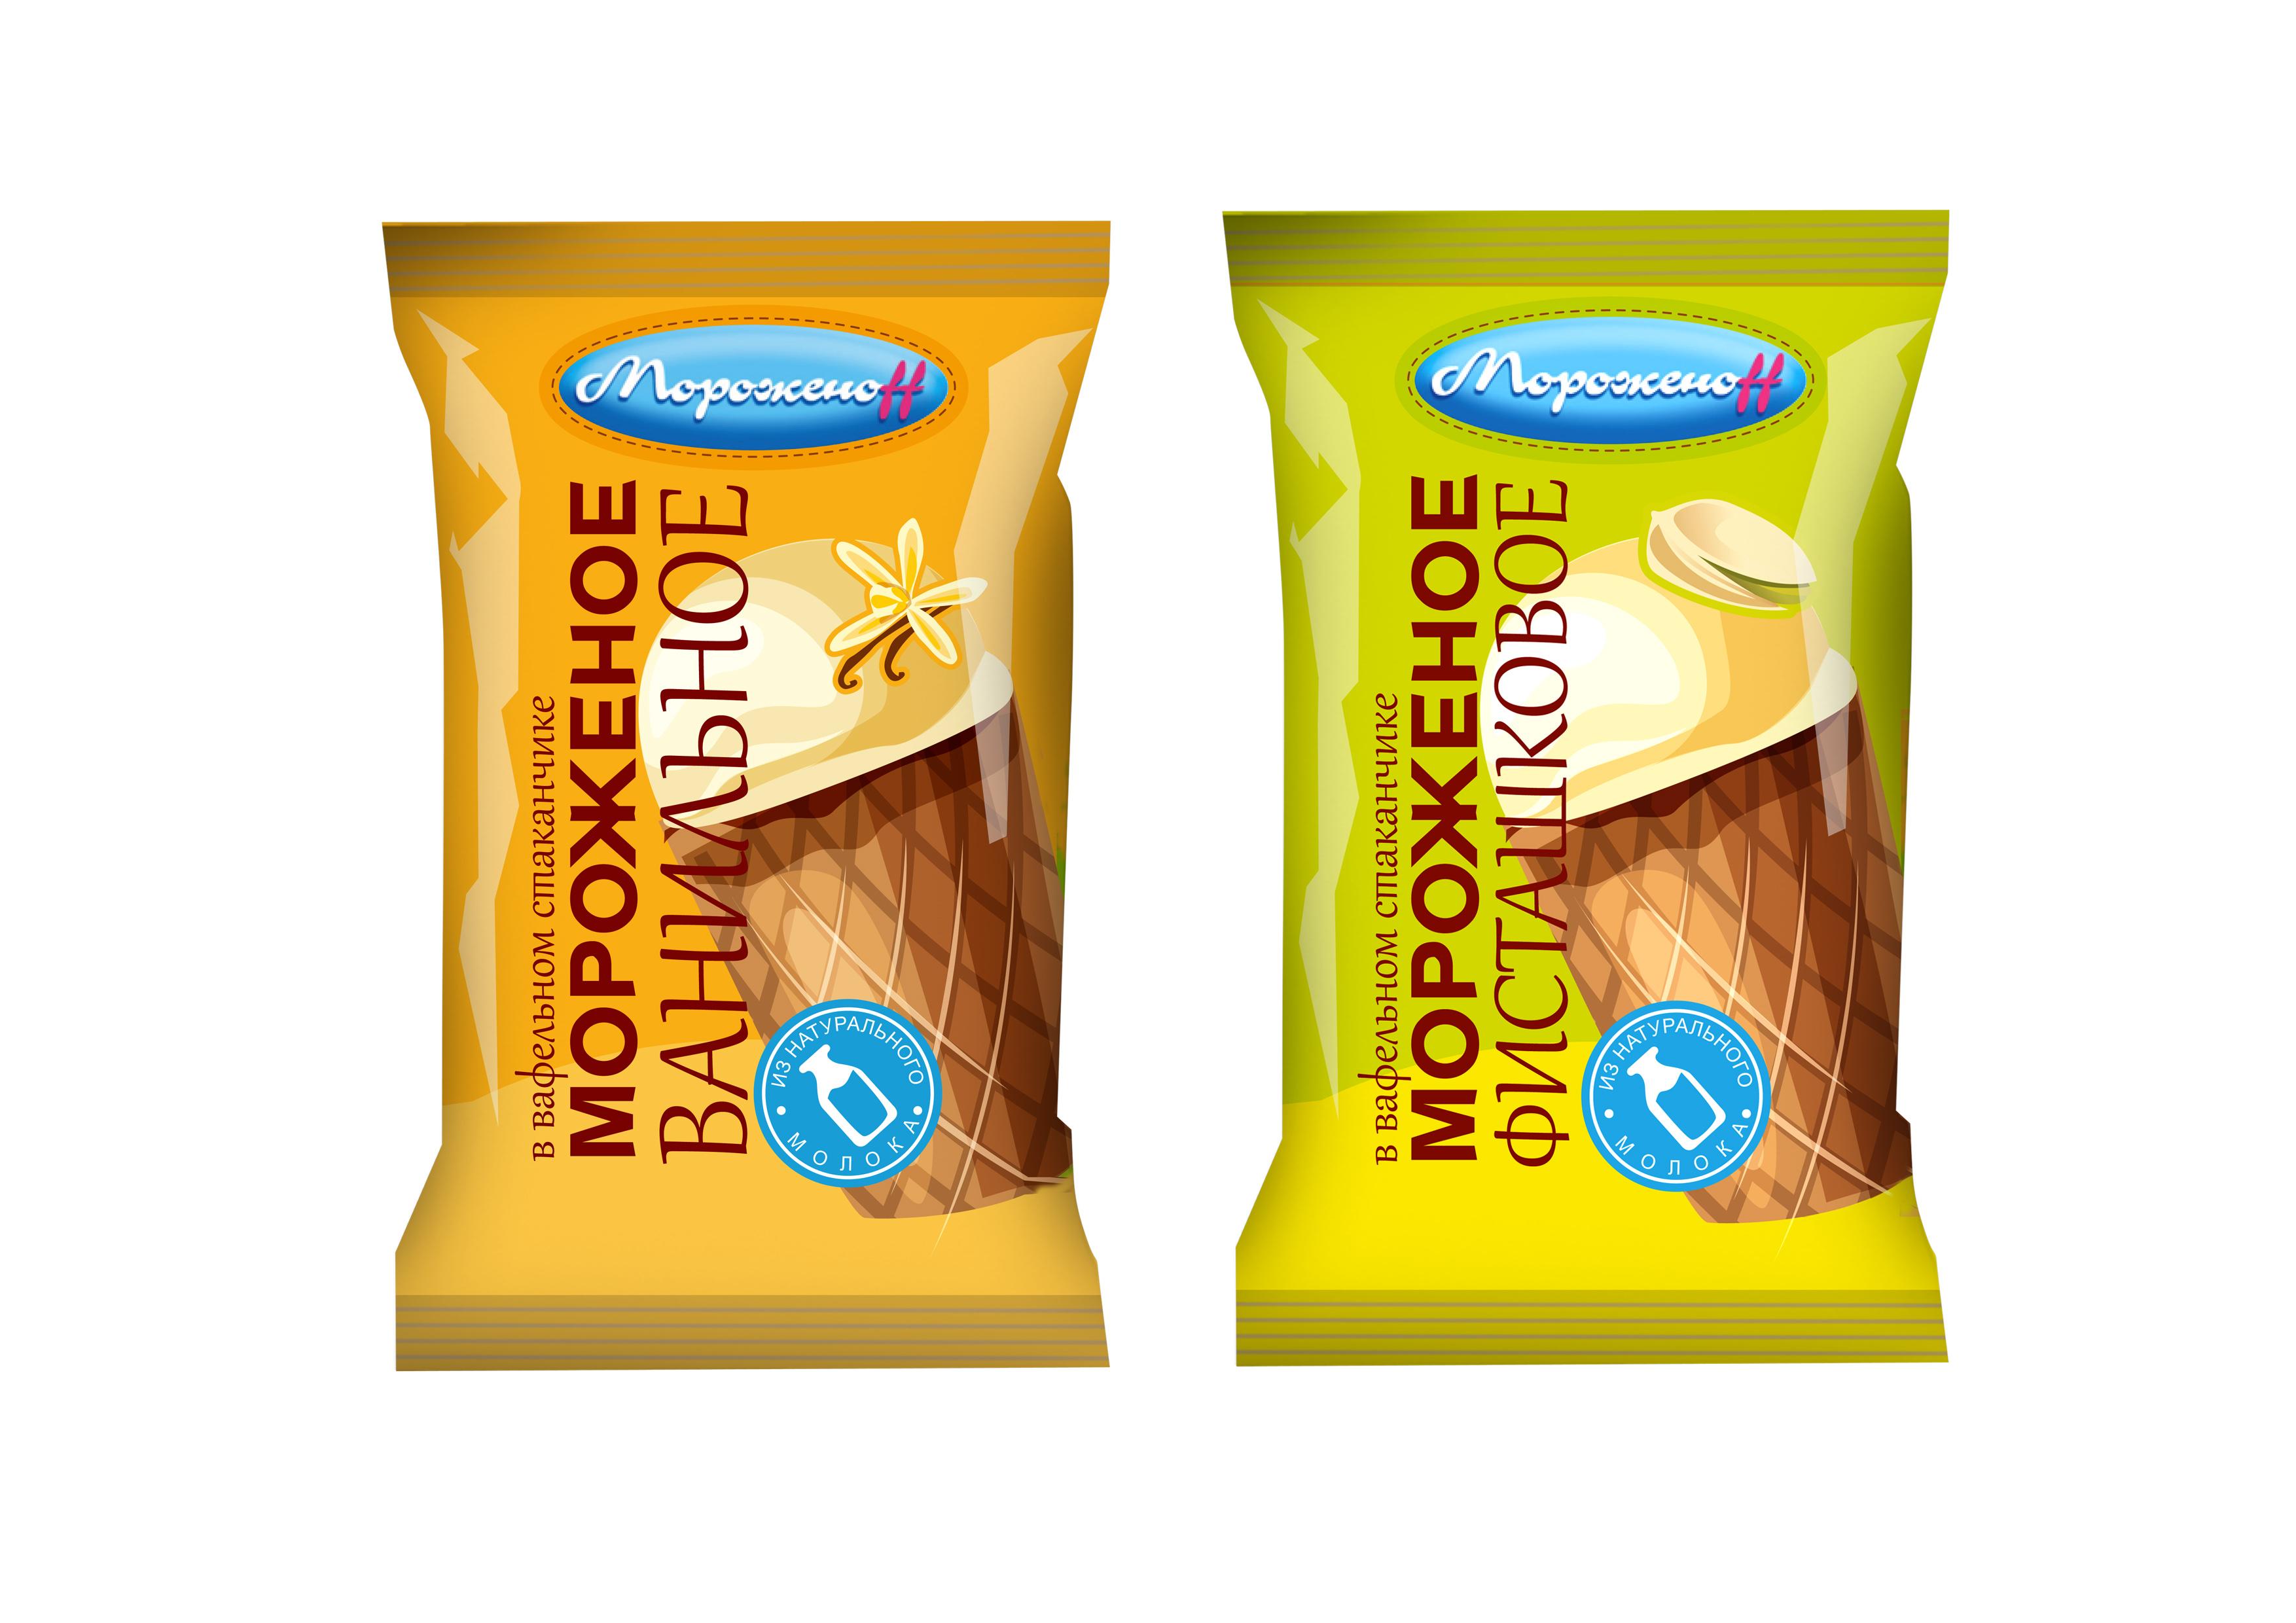 Разработка дизайна для упаковки мороженого фото f_973530f9d0369410.jpg